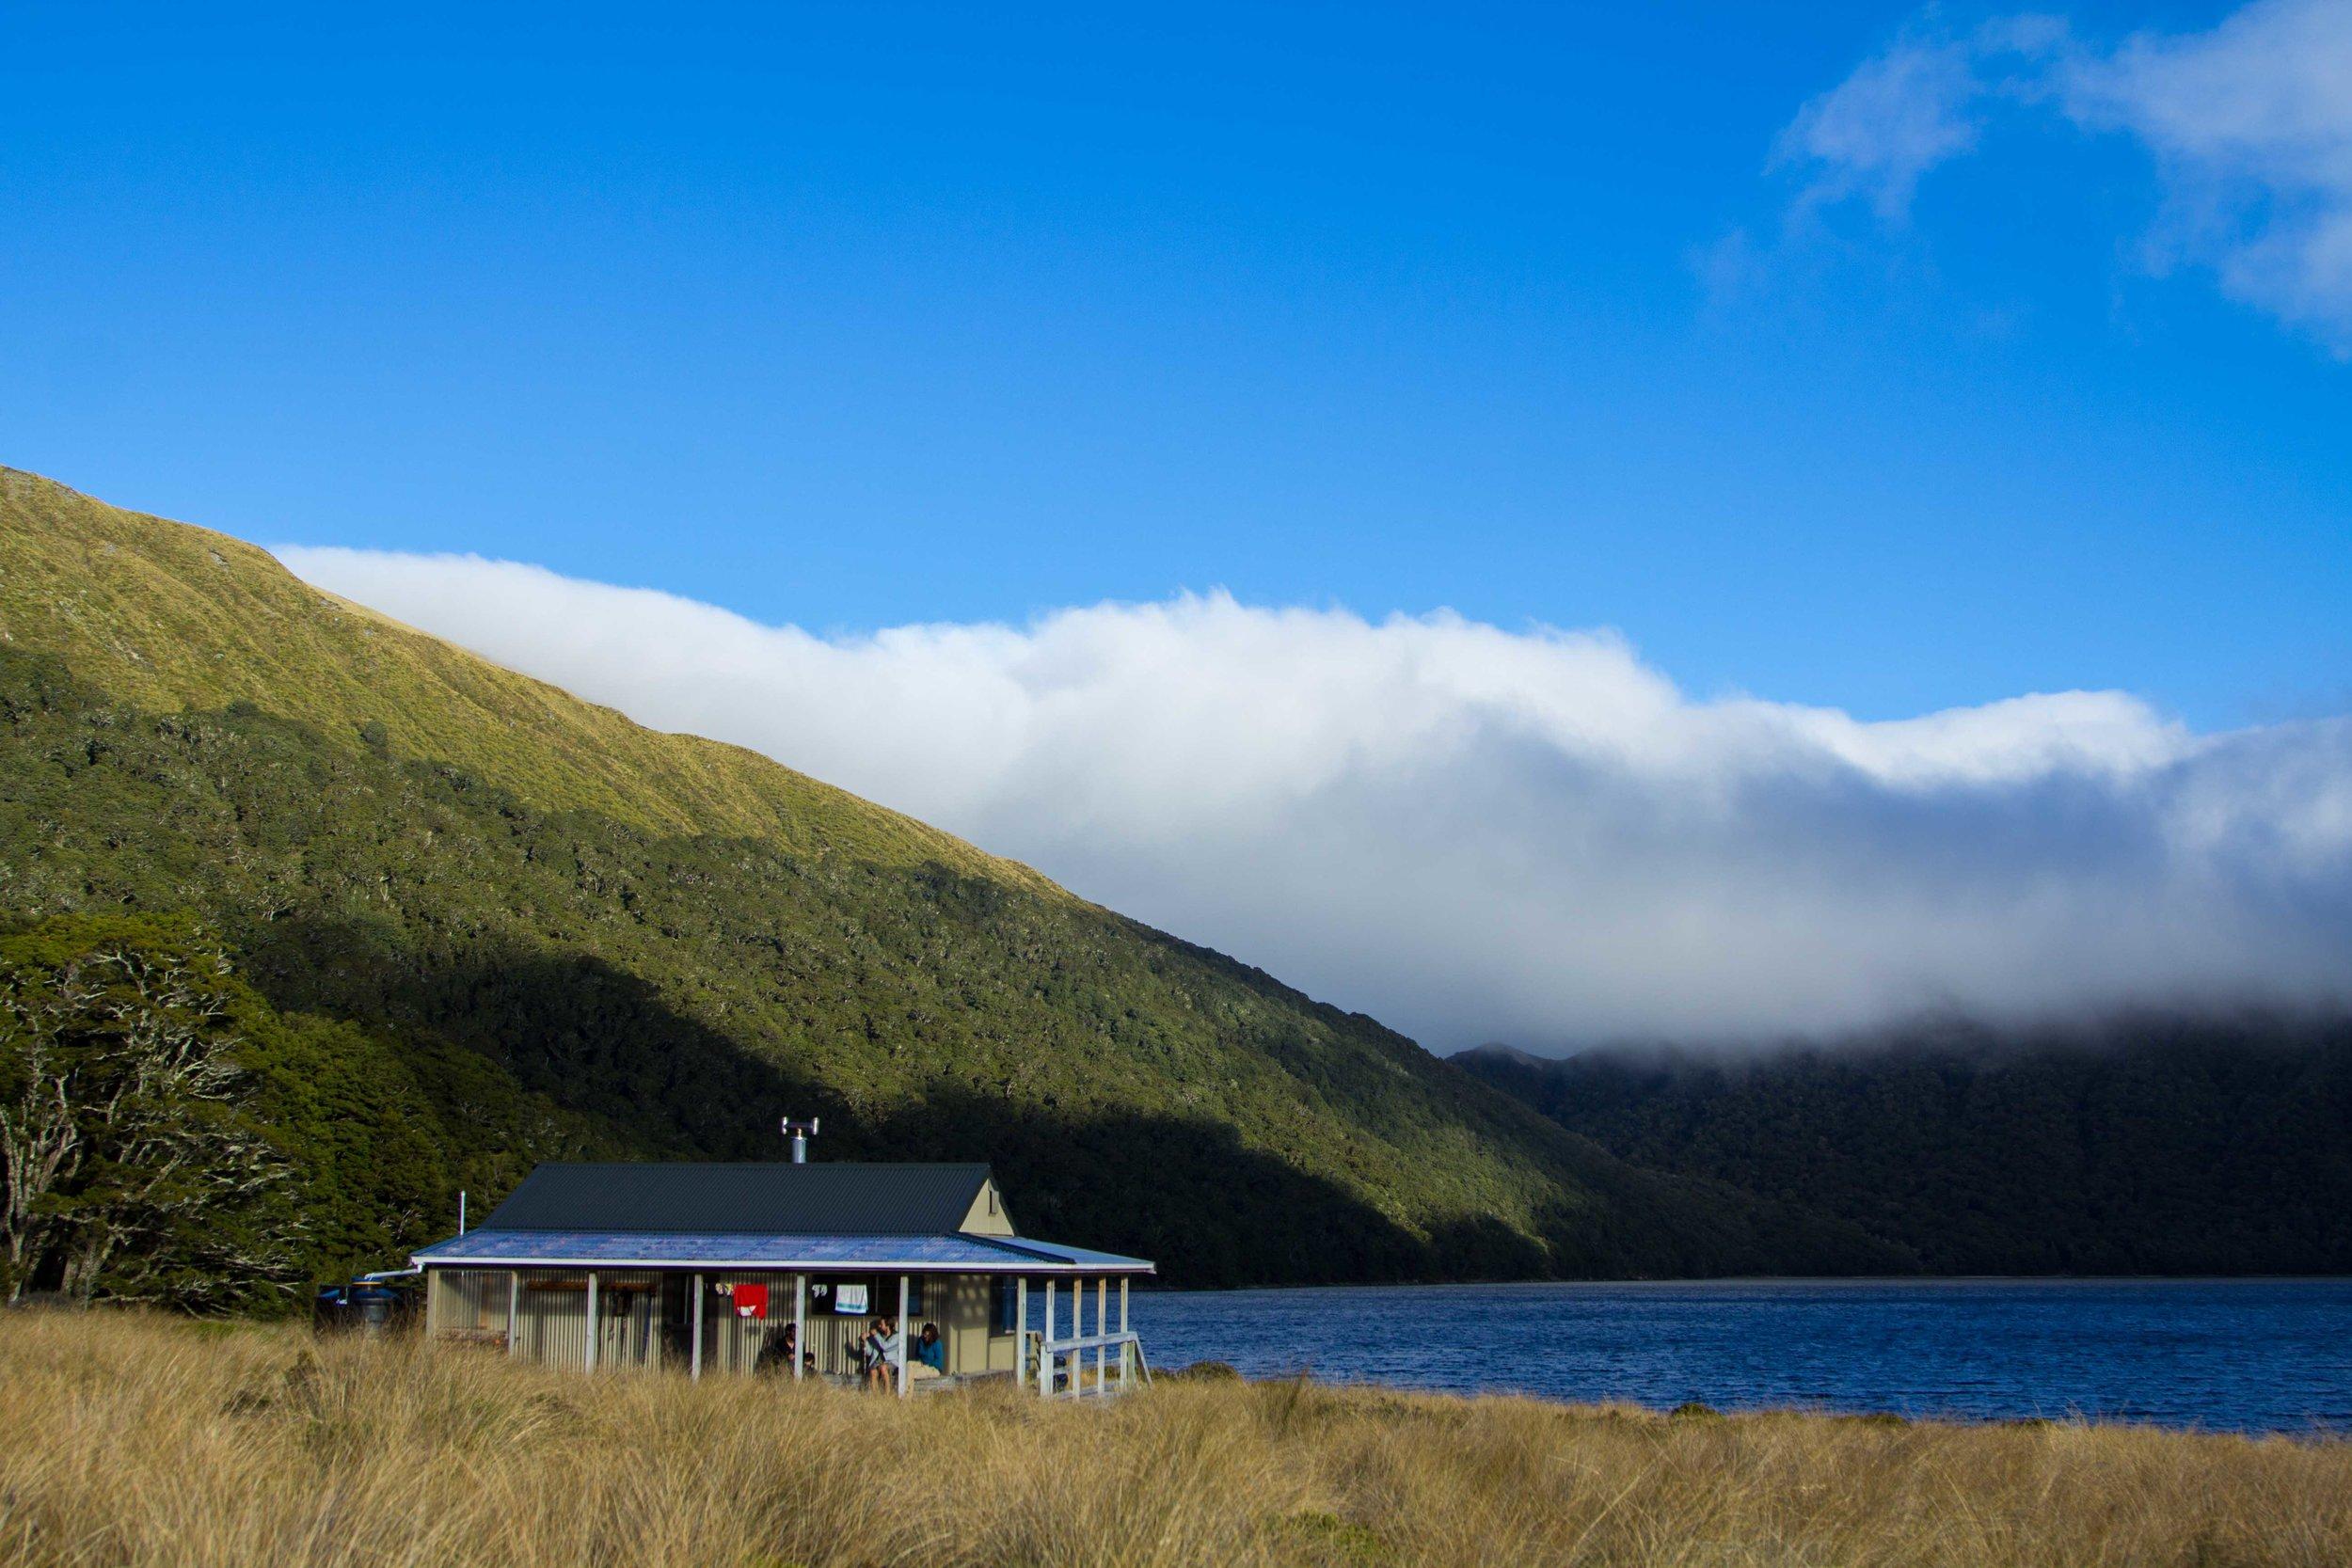 Green Lake Hut Lake Monowai Fiordland NAtional Park New Zealand (1 of 9).jpg